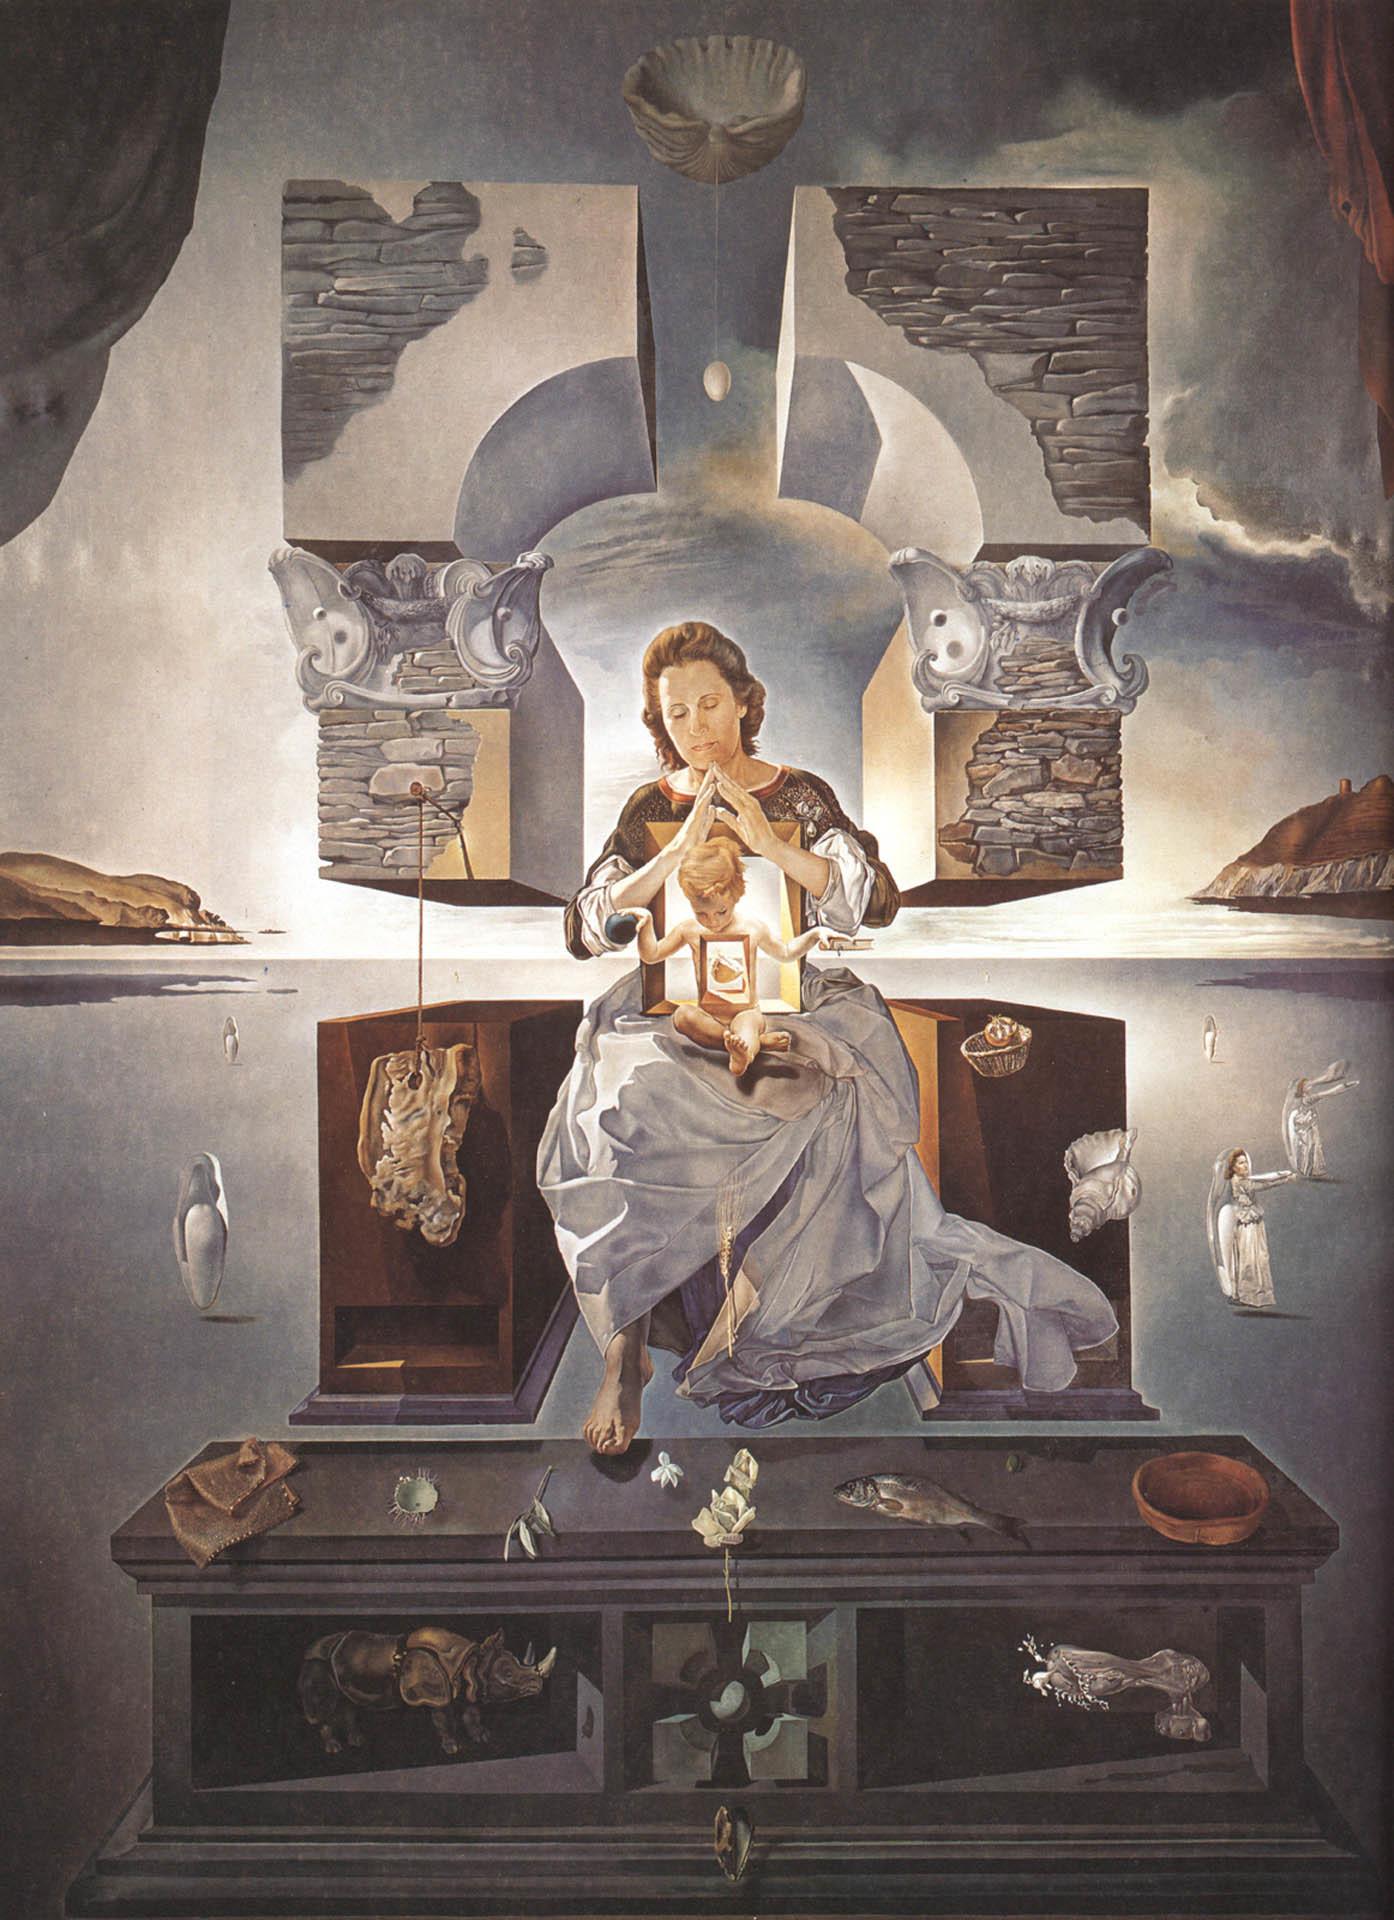 https://www.wallpapers-free.co.uk/arts/surrealist/salvador_dali/the-madonna-of-port-lligat-ii.jpg  | Surrealist art | Pinterest | Salvador, Dali and Madonna